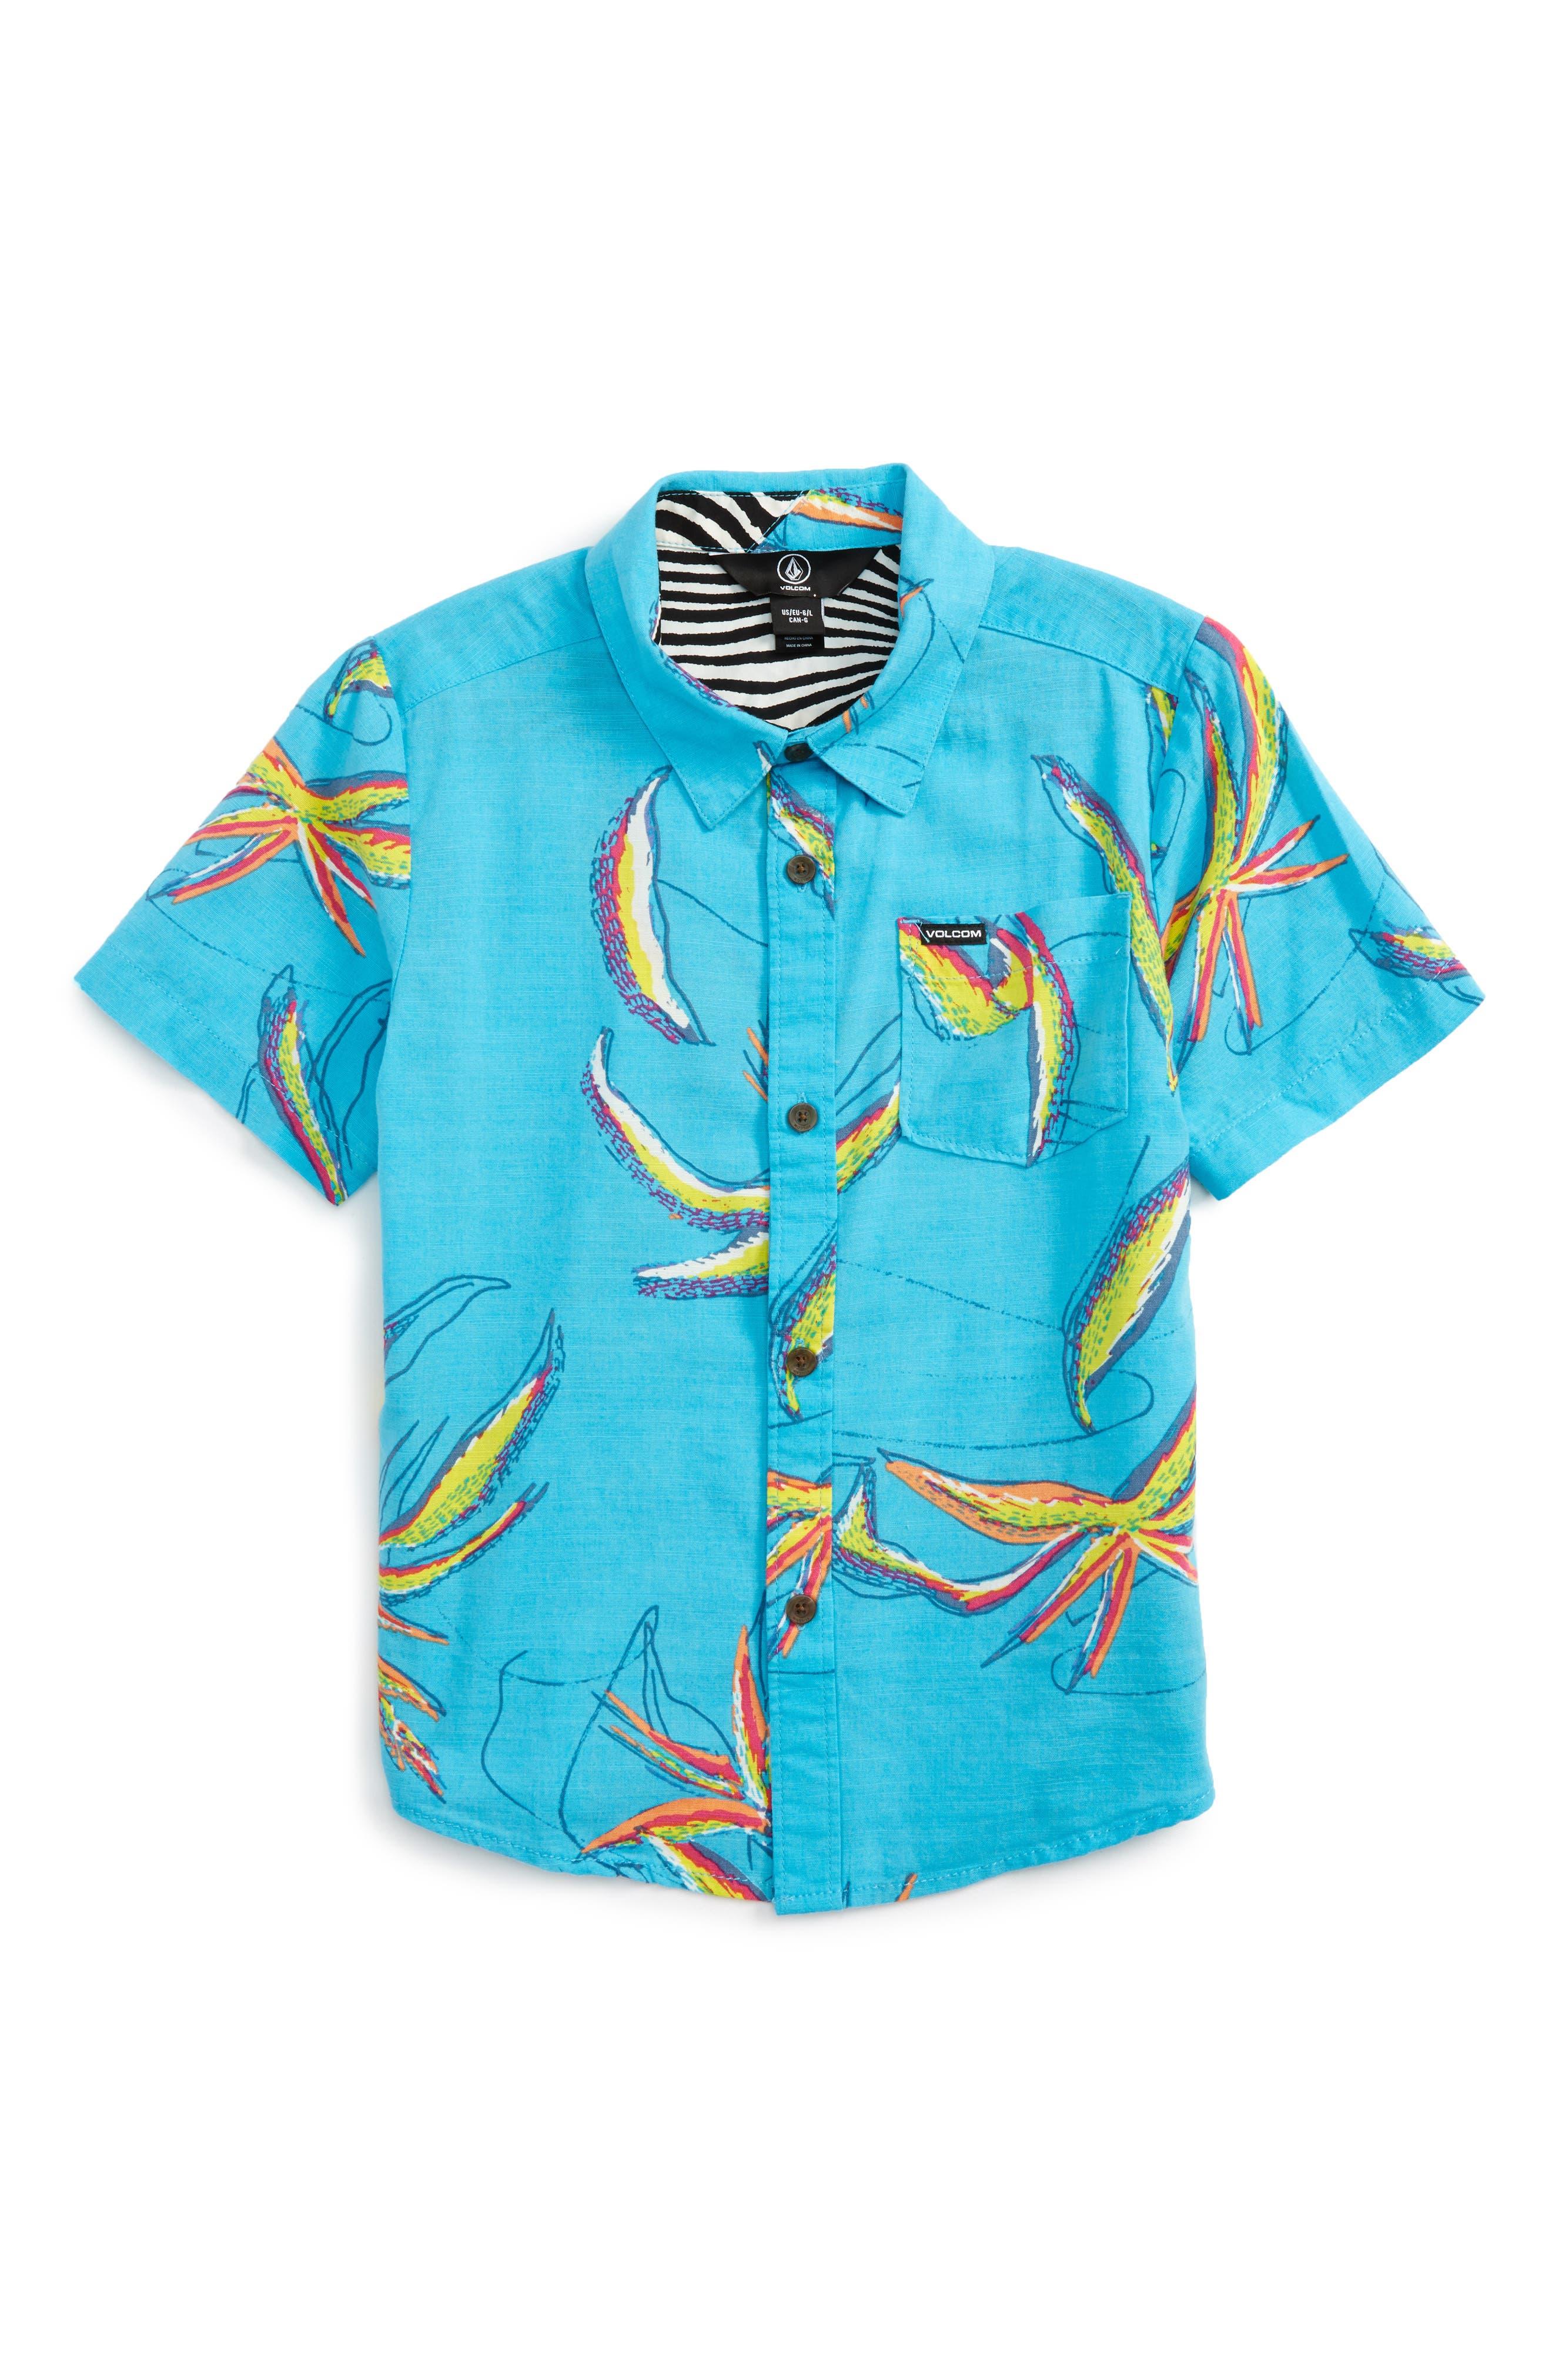 Main Image - Volcom Motel Floral Short Sleeve Woven Shirt (Toddler Boys & Little Boys)